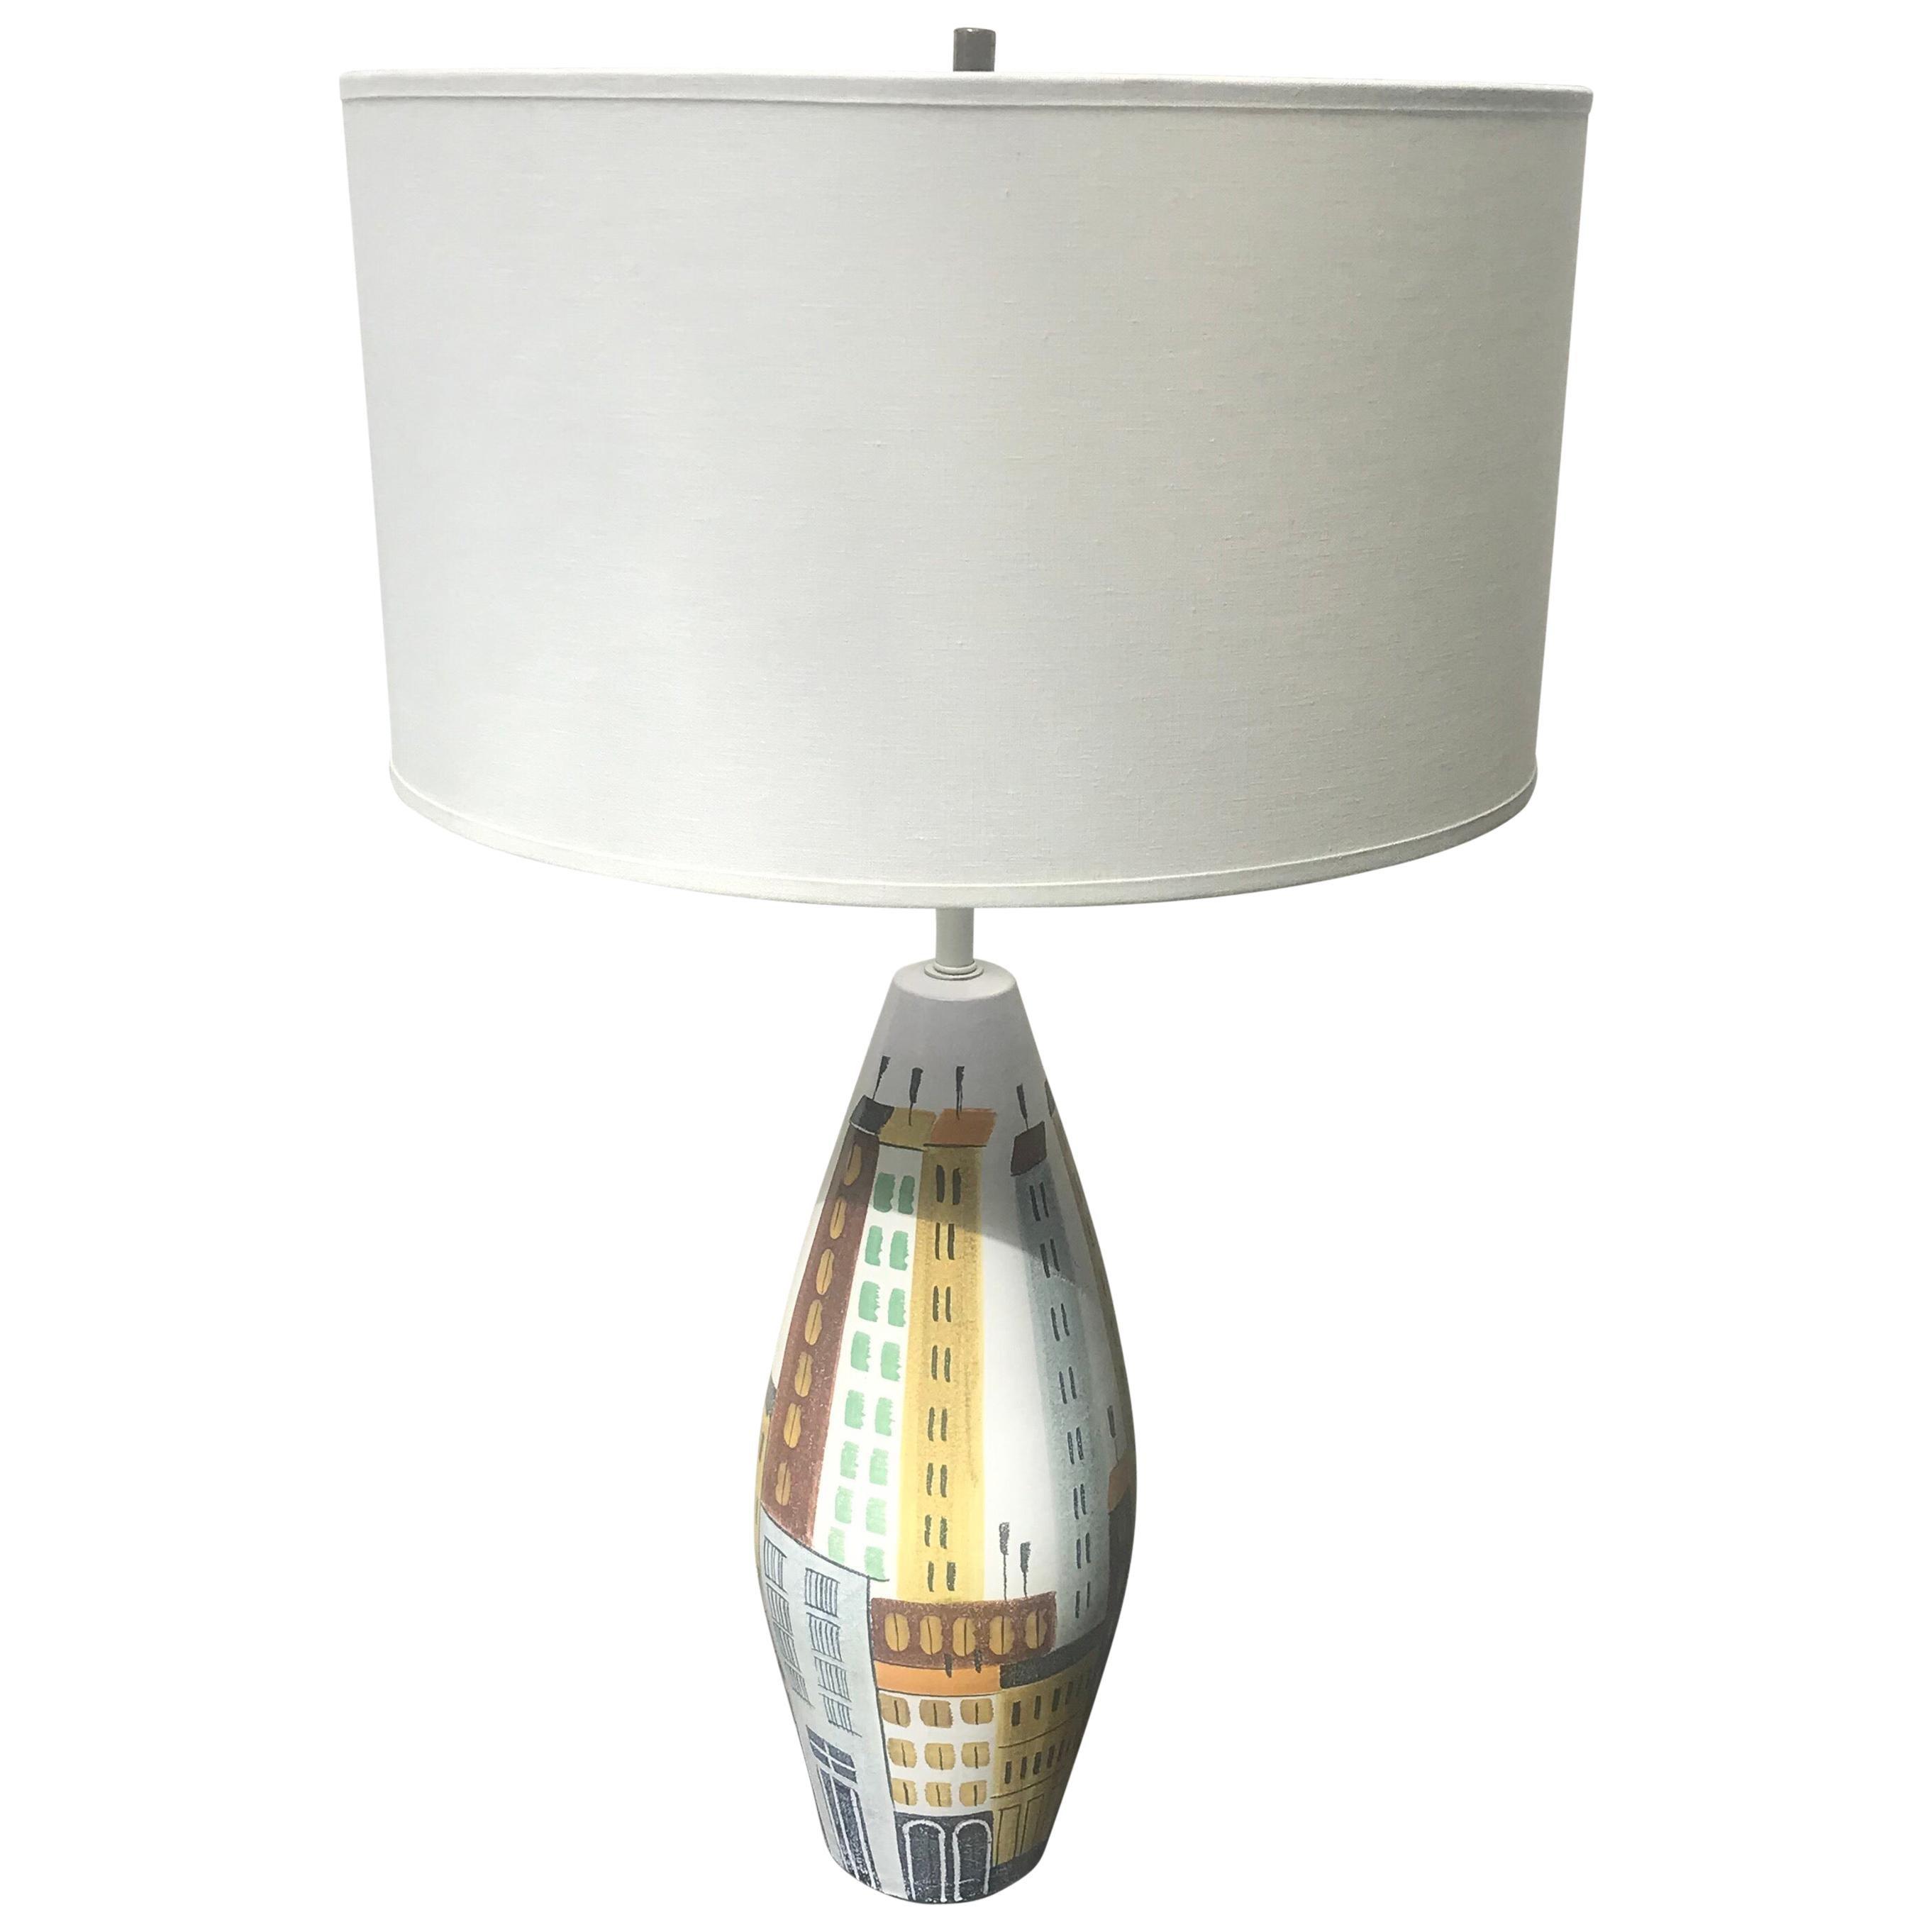 Mid-Century Modern Bitossi Ceramic Table Lamp, Cityscape, 1960s, Italy